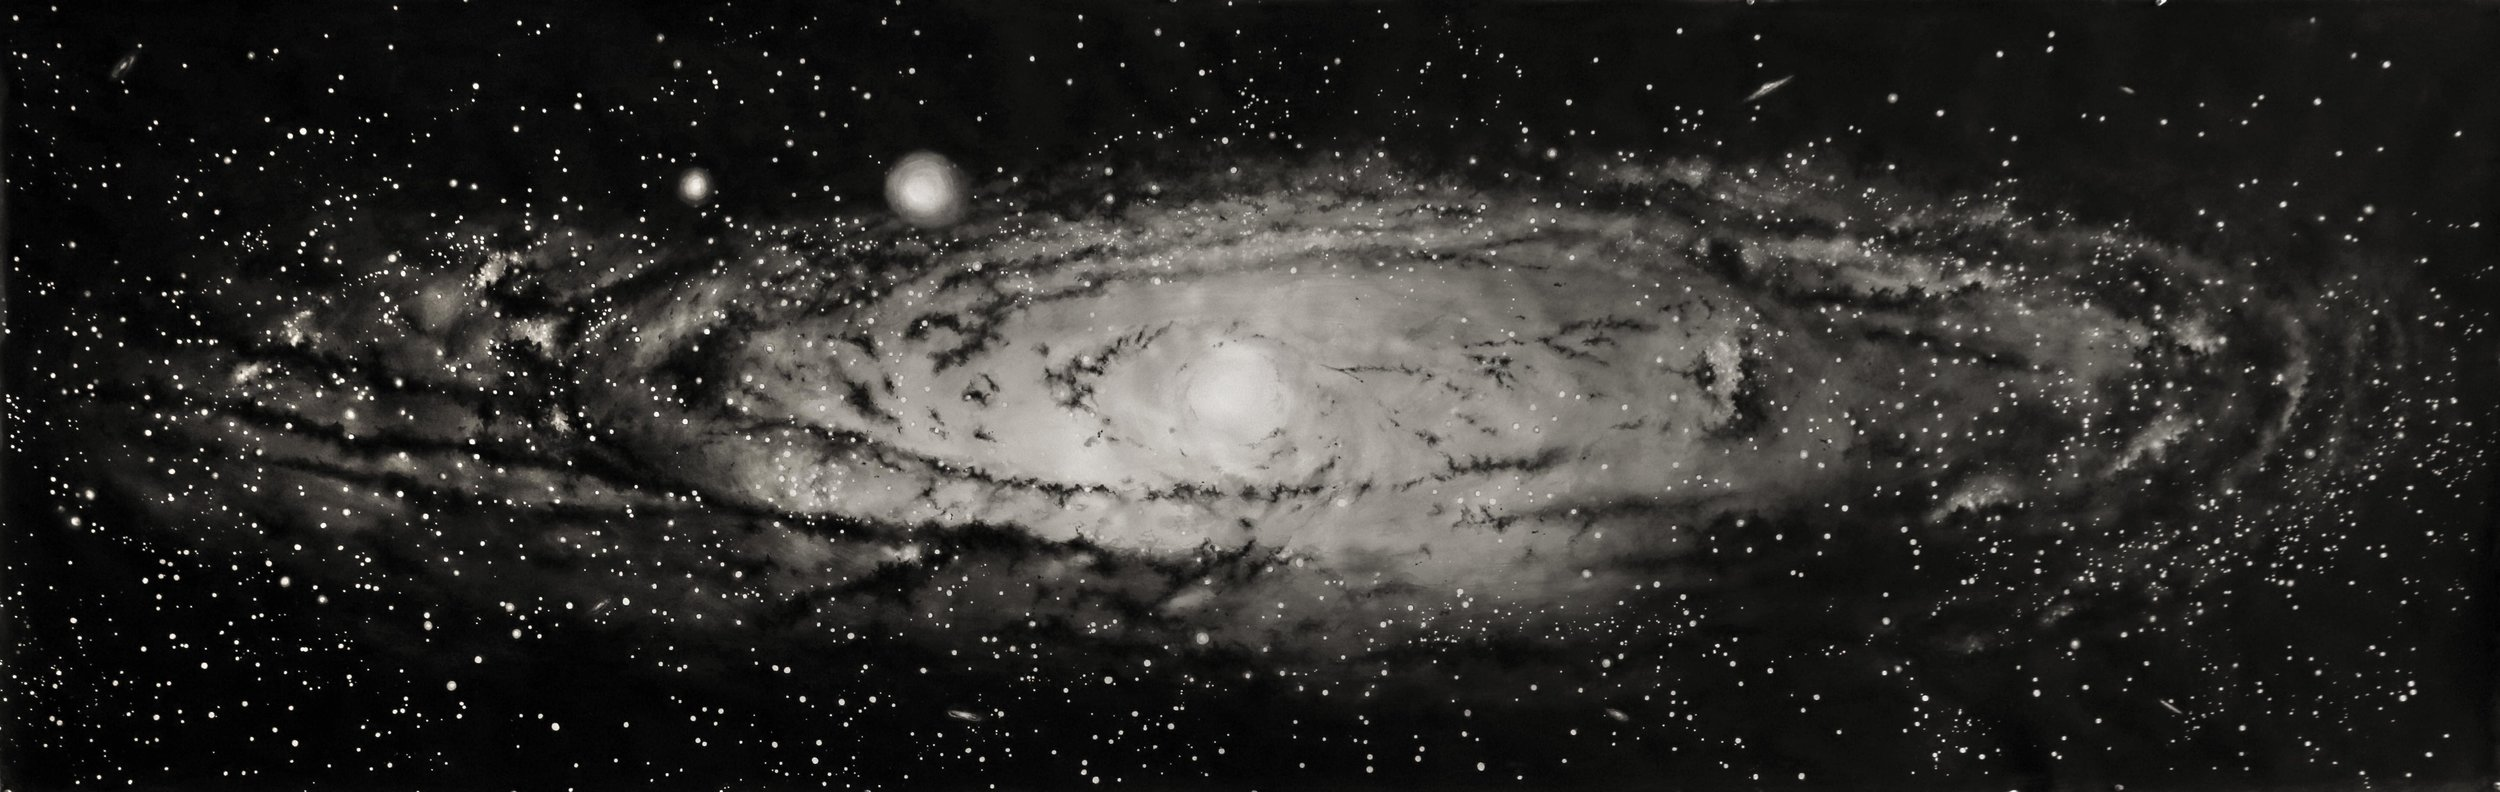 "Thomas Broadbent, ""Andromeda"" watercolor on paper, 44"" x 136"""